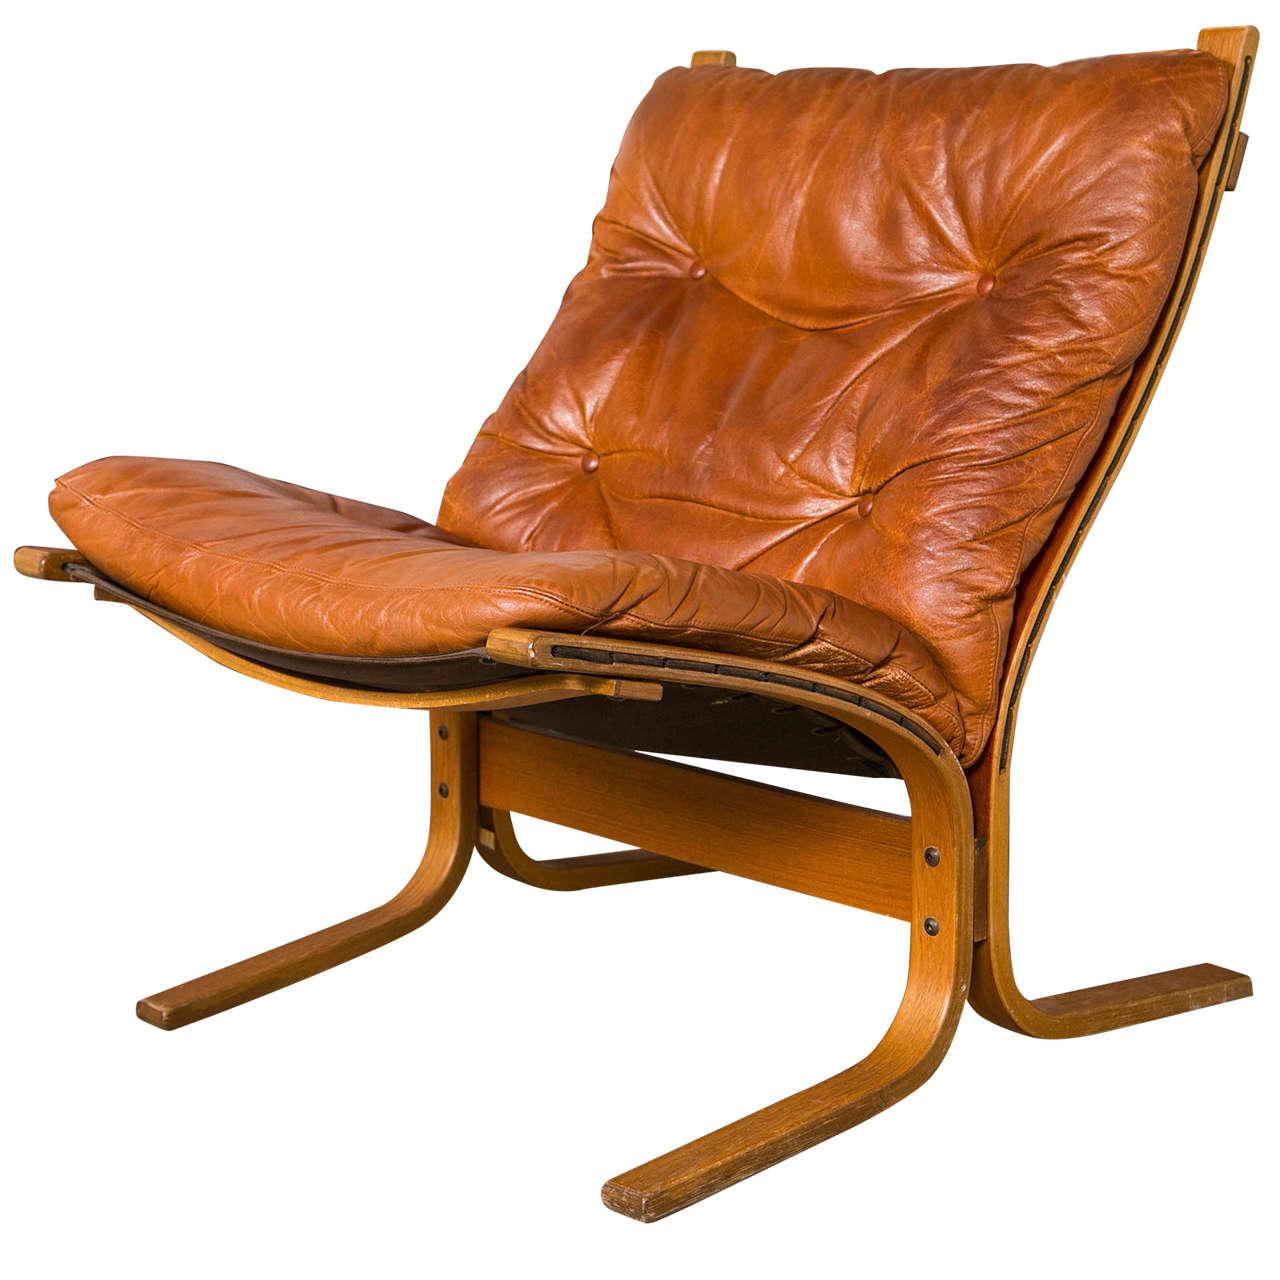 Ingmar Relling Leather Siesta Chair At 1stdibs